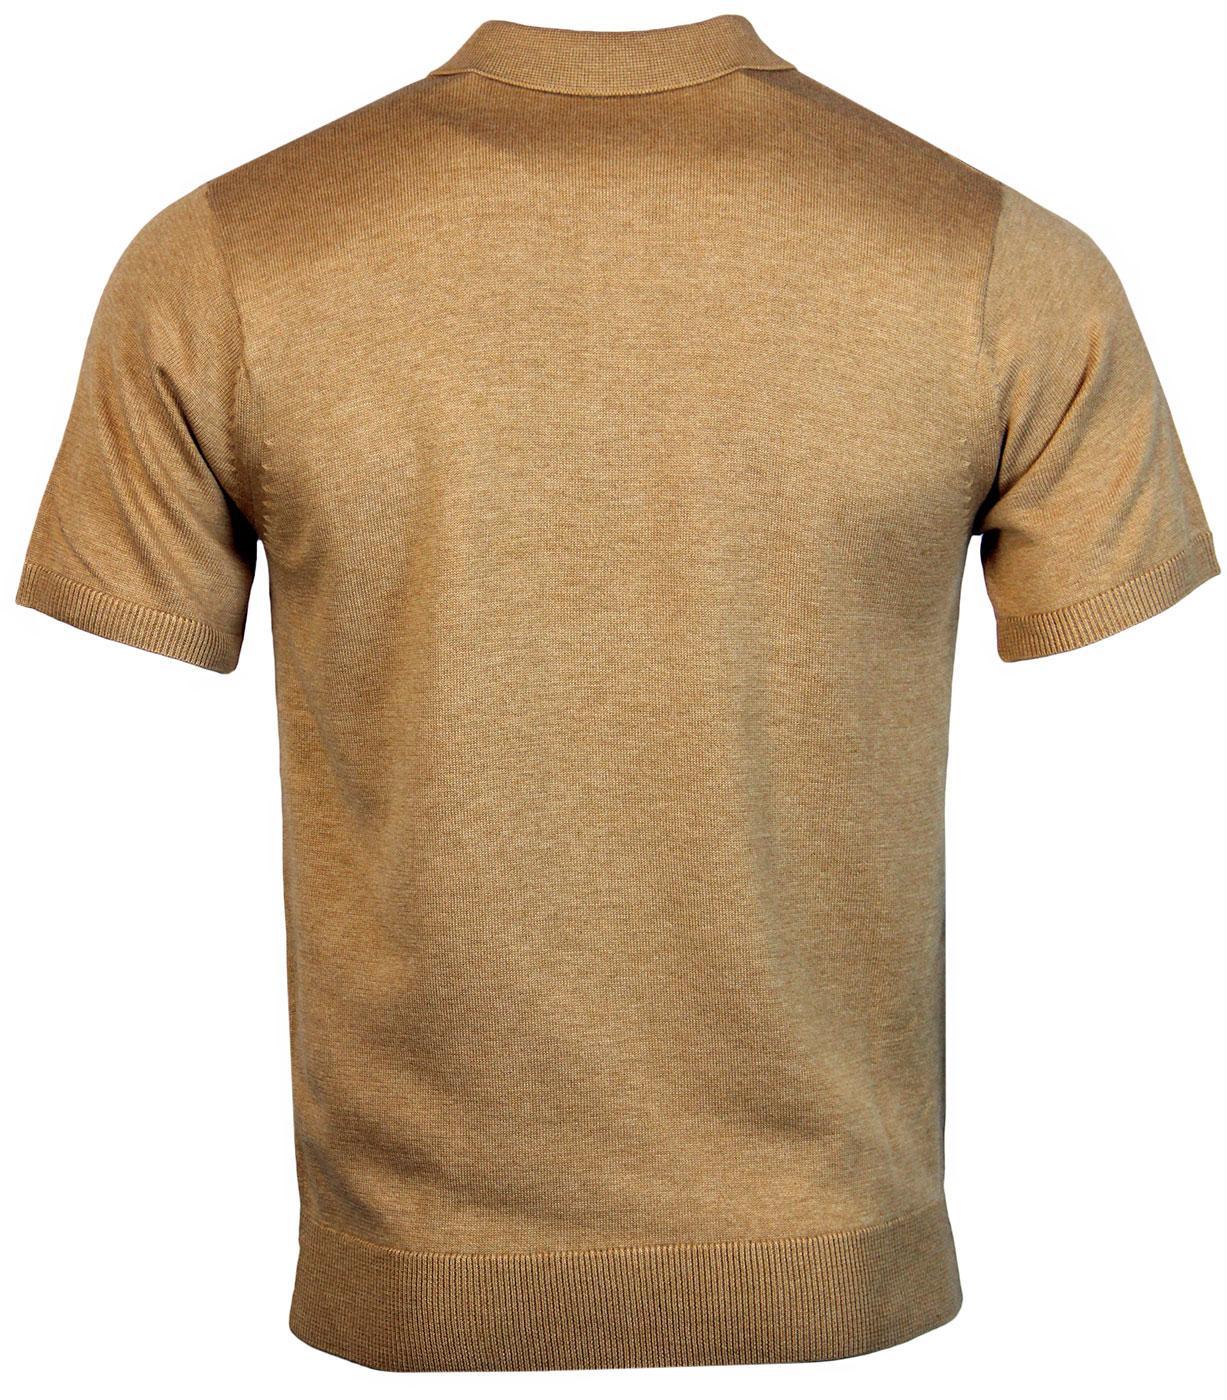 b8e68177 GABICCI VINTAGE Retro 1960s Mod Fine Knit Polo shirt in Honey